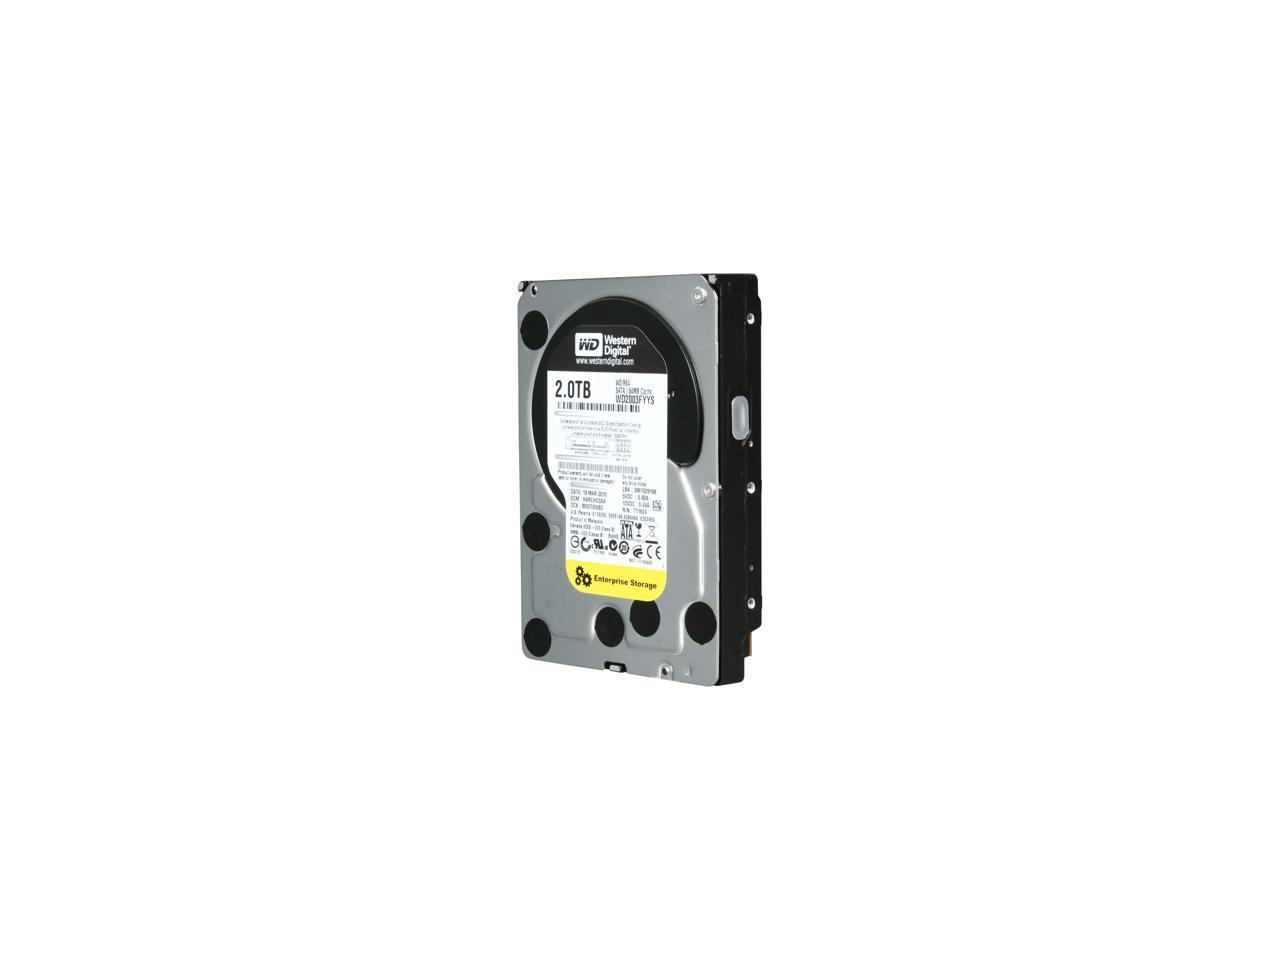 "Refurbished: WD Grade A WD2003FYYS 2TB 3.5"" HDD SATA 3.0Gb/s RE4 7200 RPM  Internal Hard Drive 1 Year Warranty"